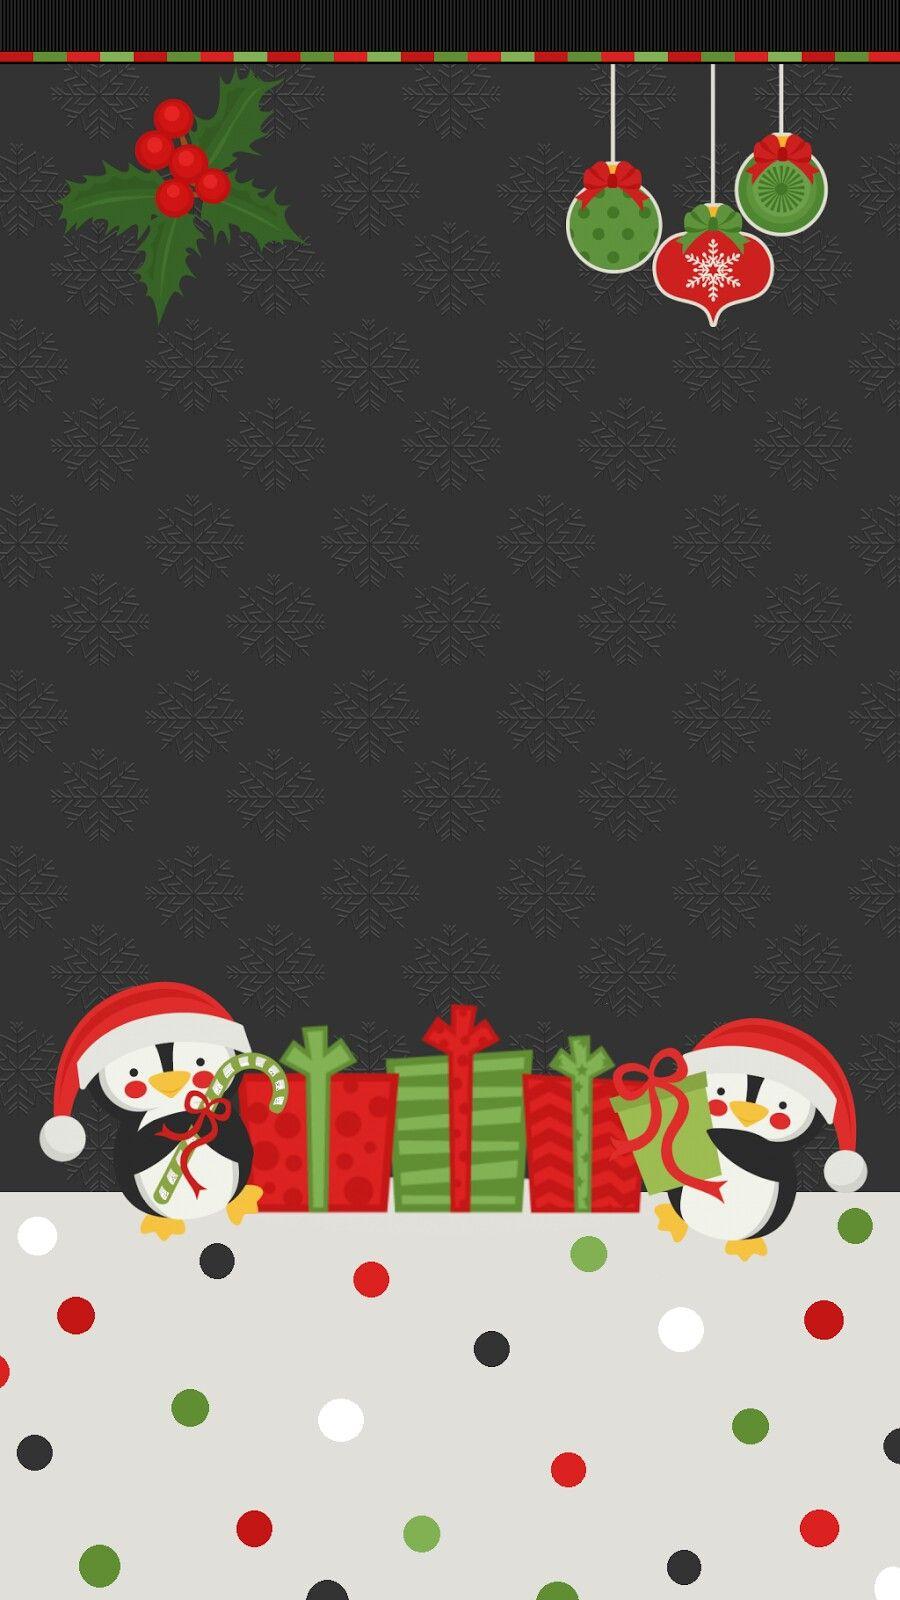 Penguins Christmas wallpaper Christmas phone wallpaper